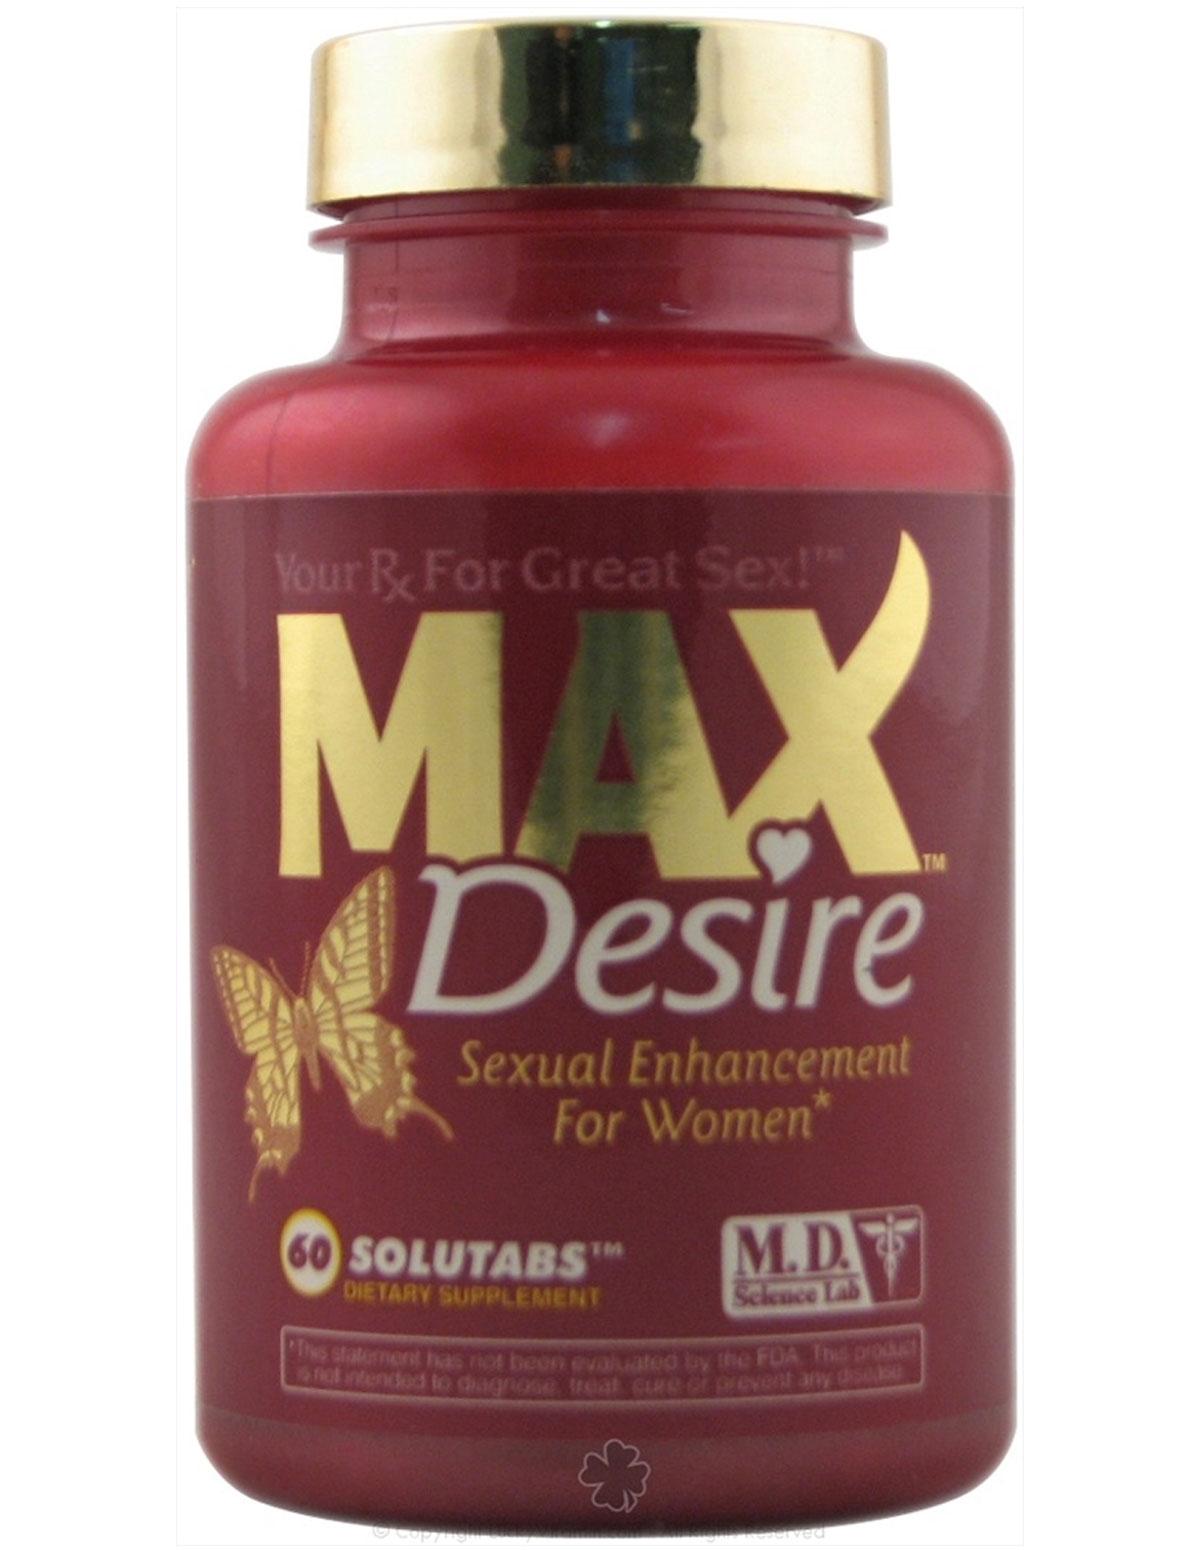 Max Desire Pills For Women 60 Ct